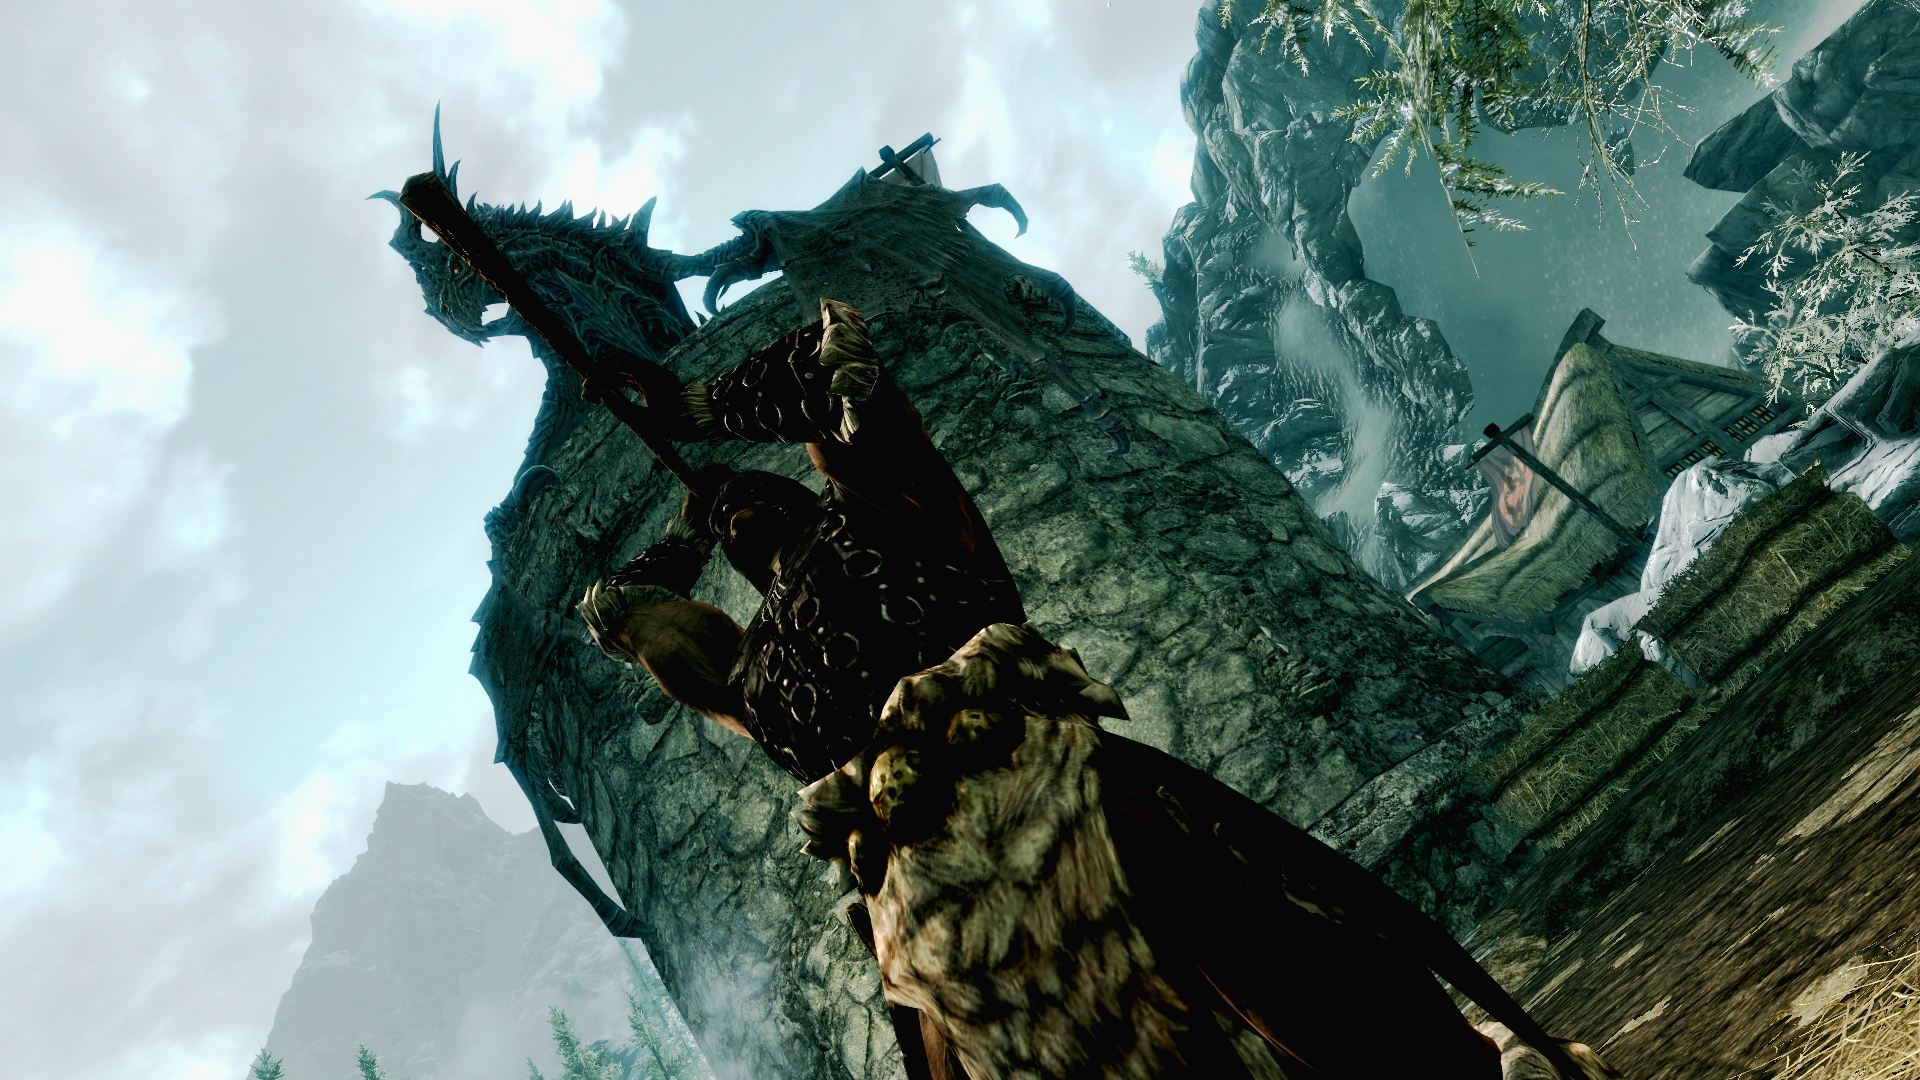 attaquée par un dragon en rêve